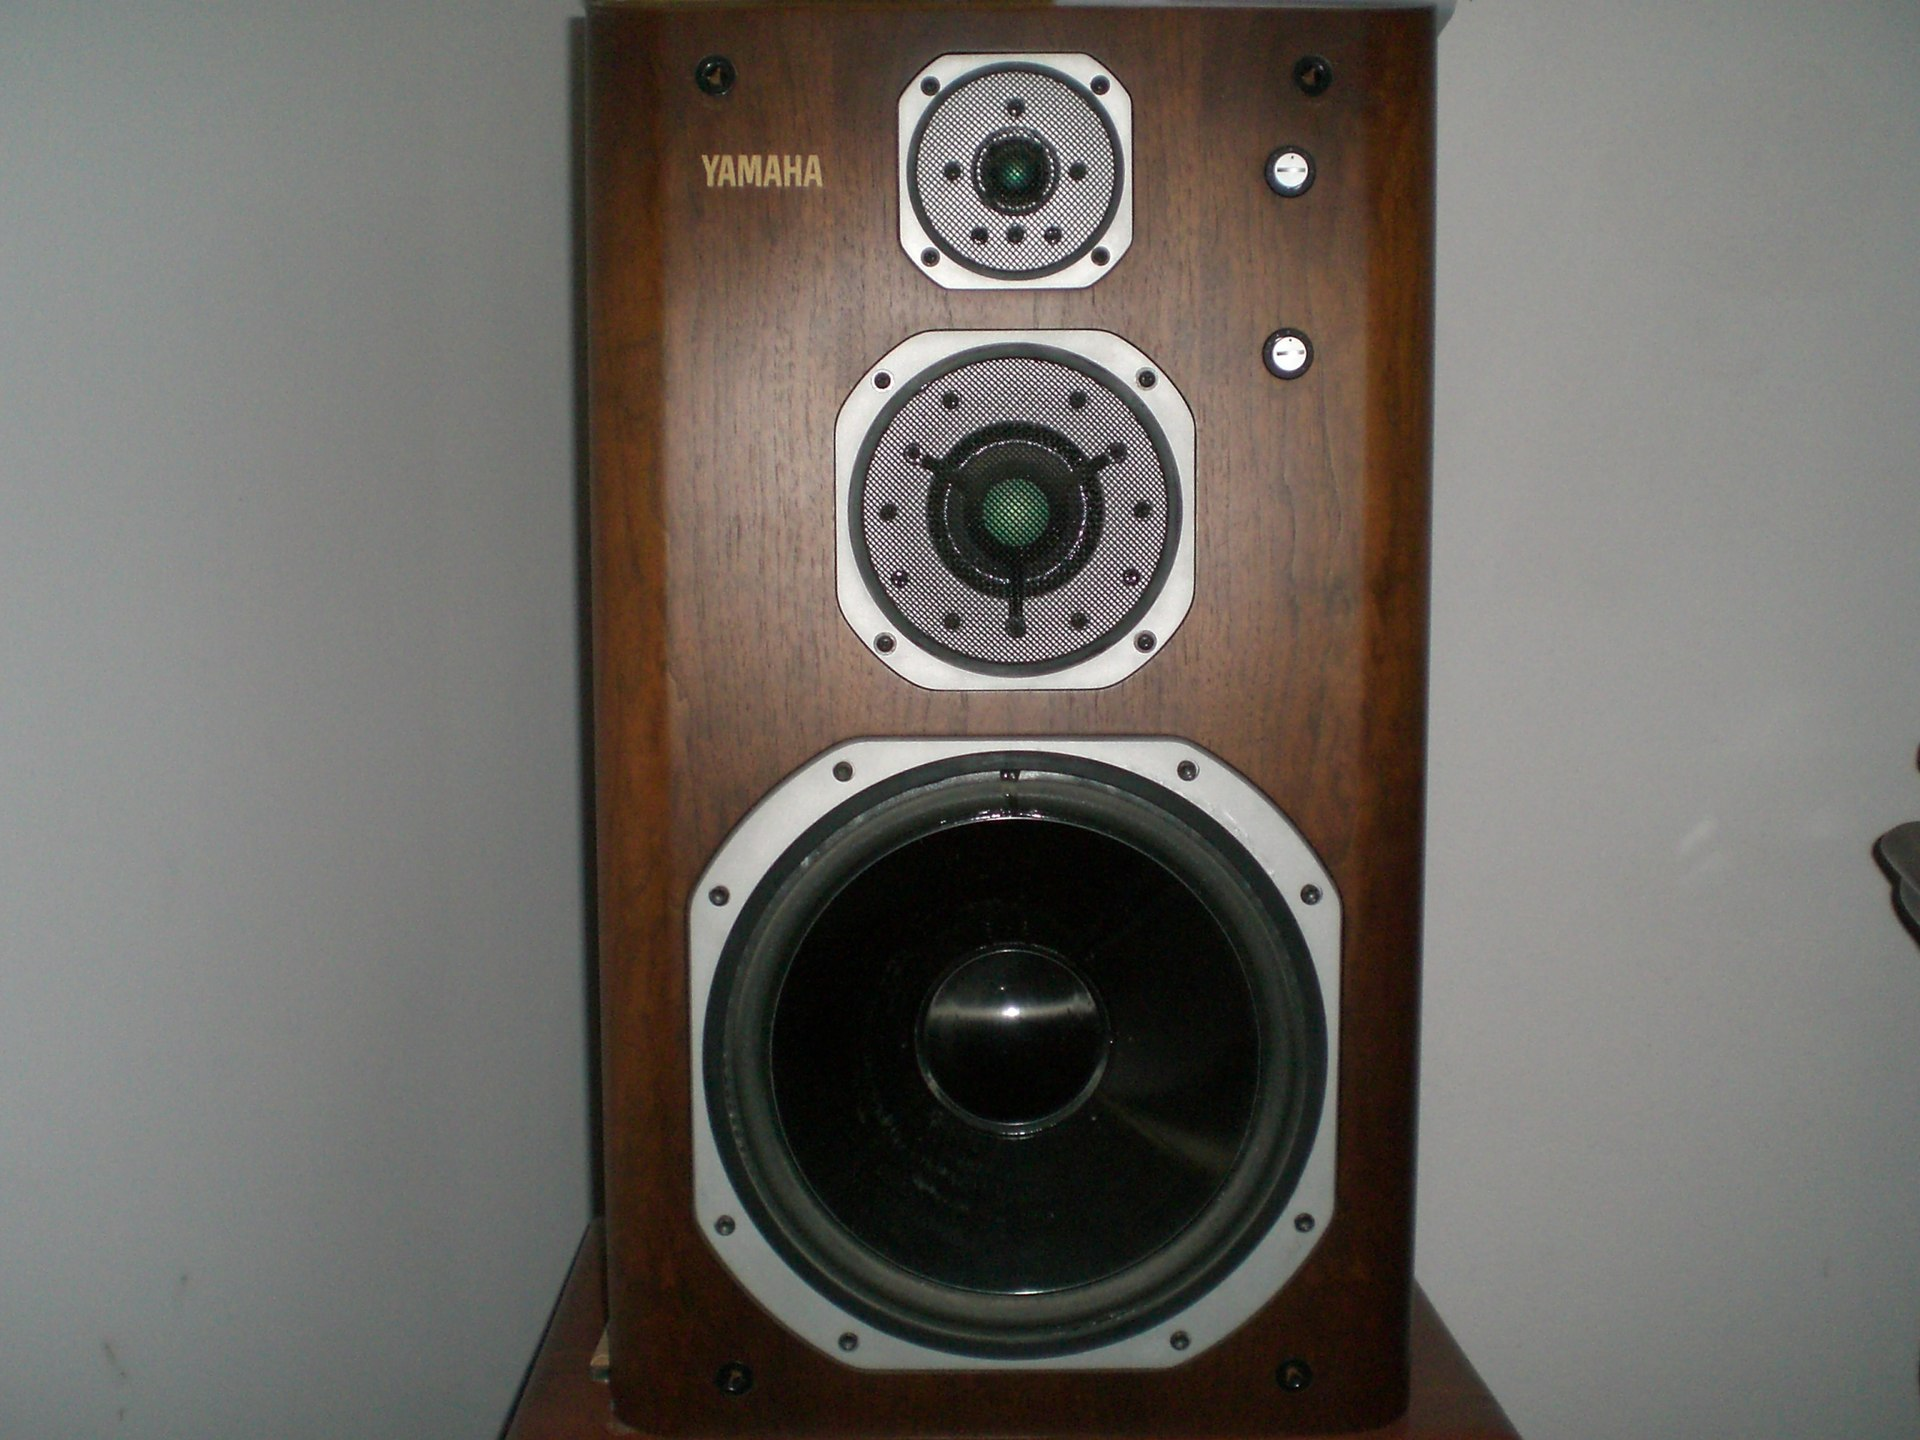 Ns 2000 wikipedia for Yamaha 10 speaker